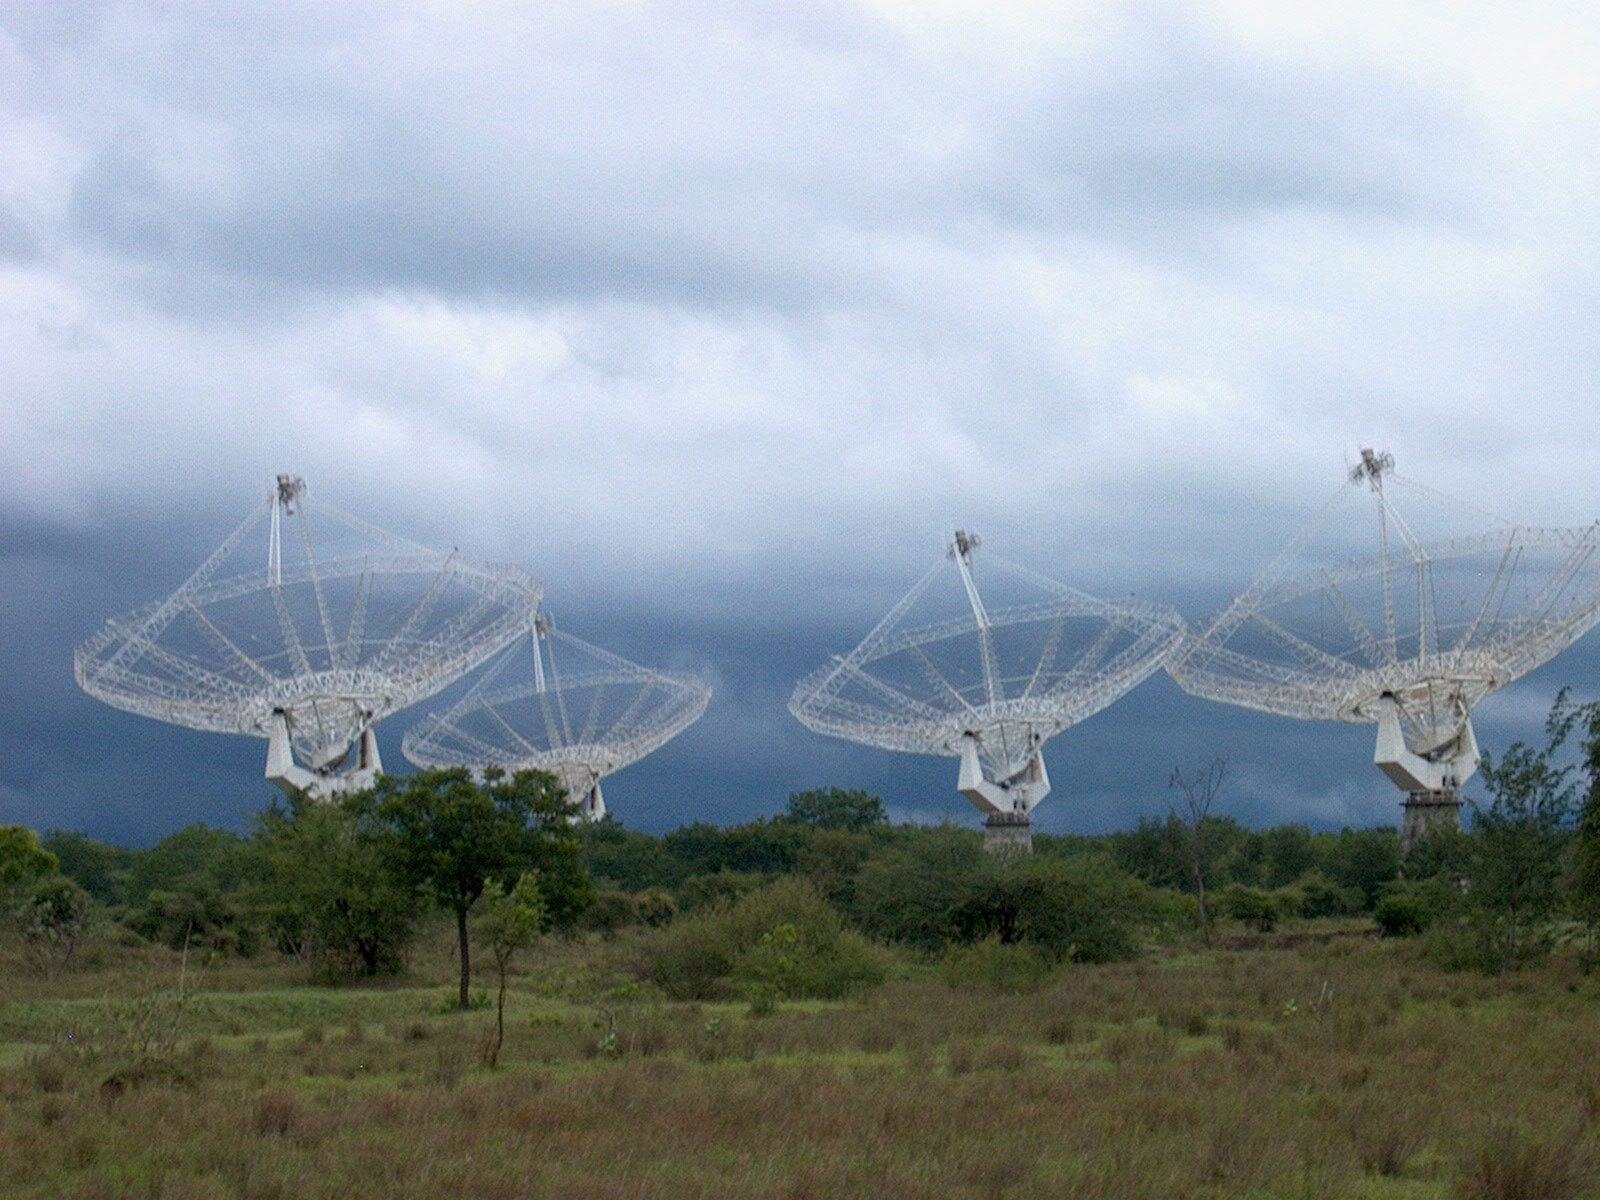 Giant Meterwave Radio Telescope. Zdroj: http://www.setileague.org/